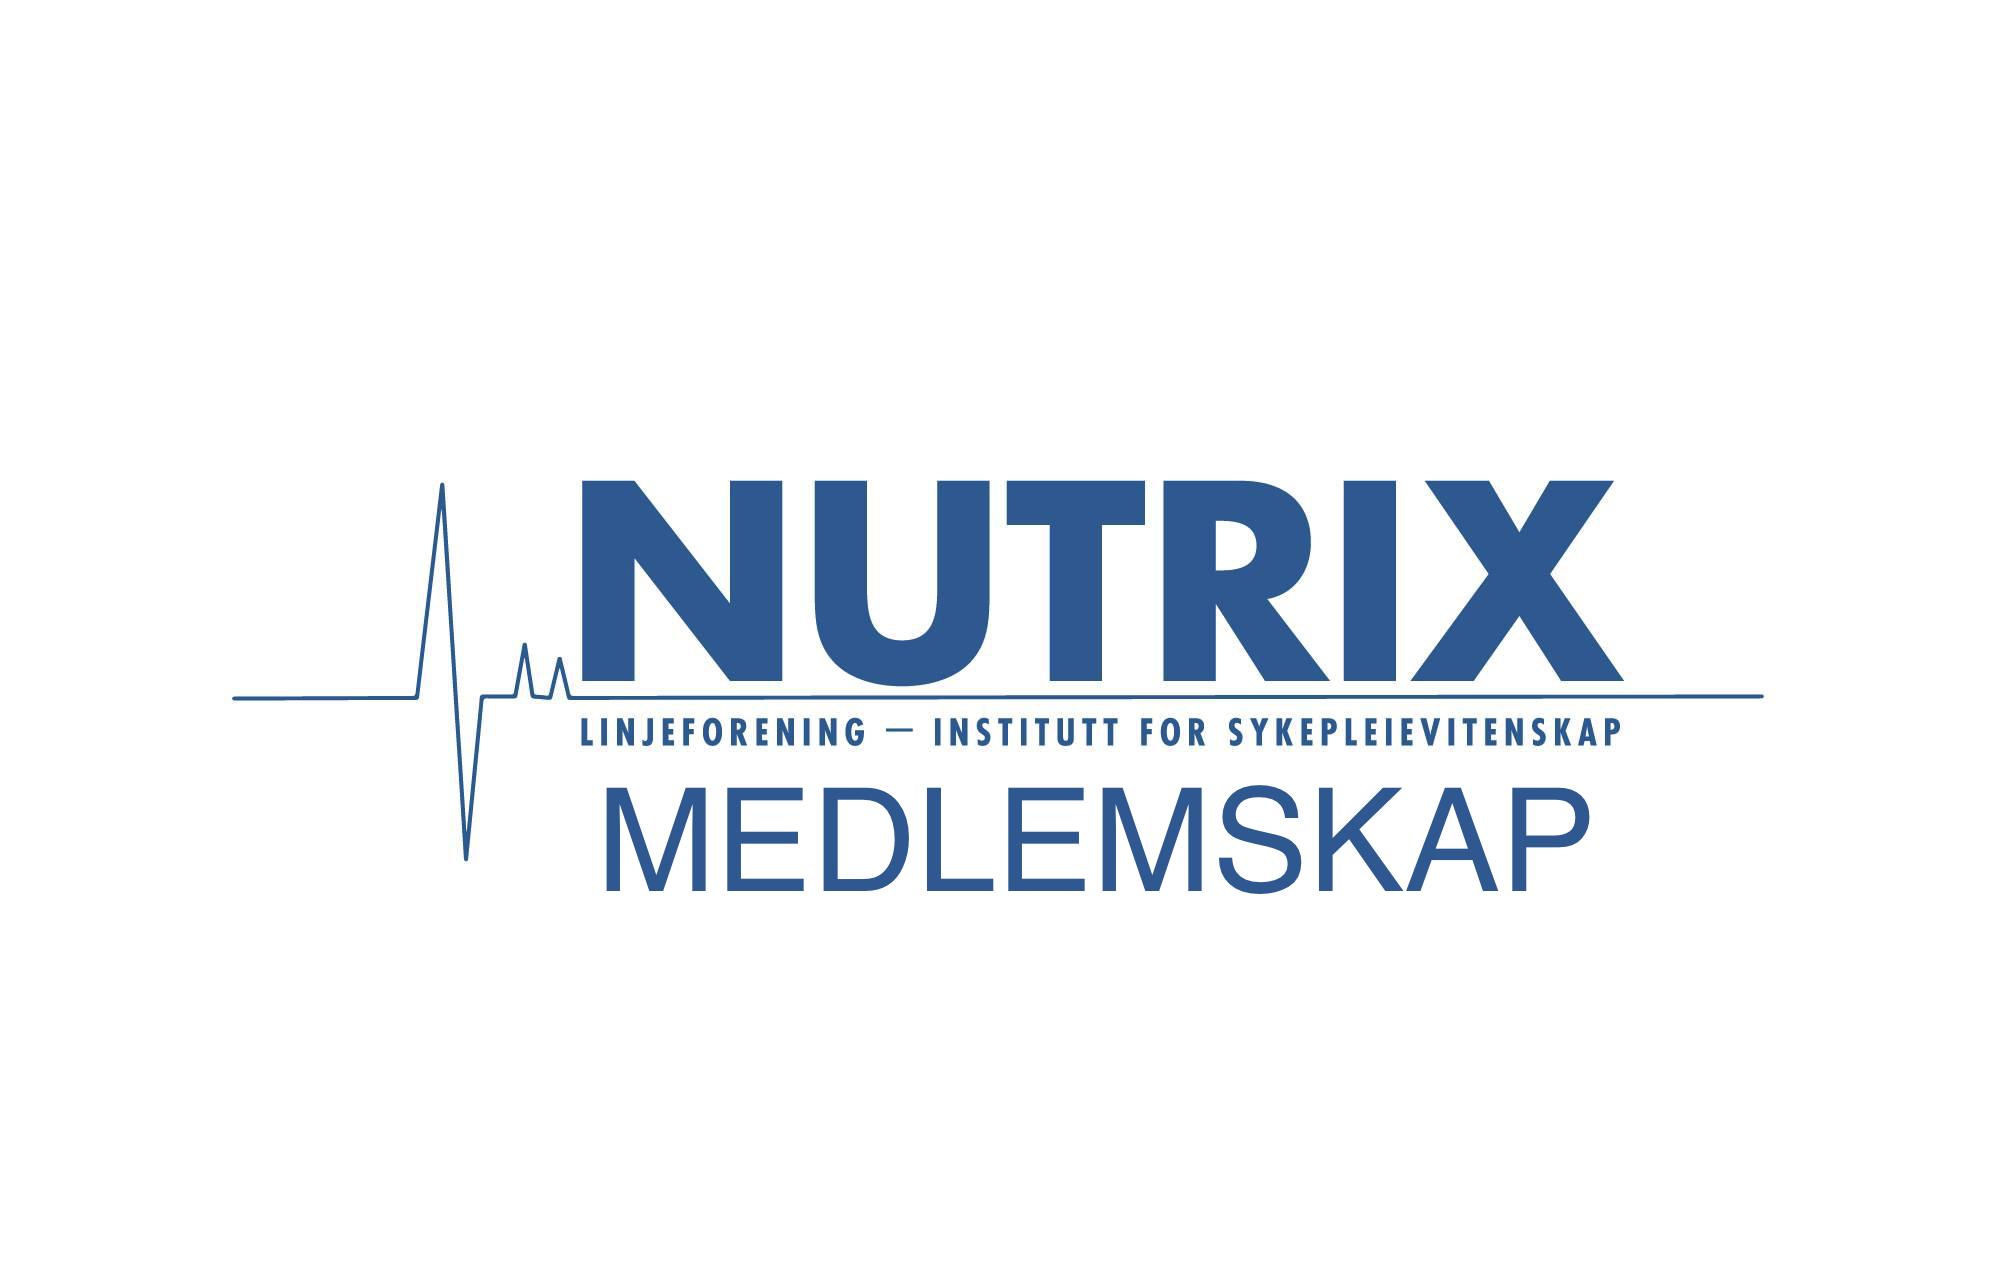 nutrixlogoMEDLEM